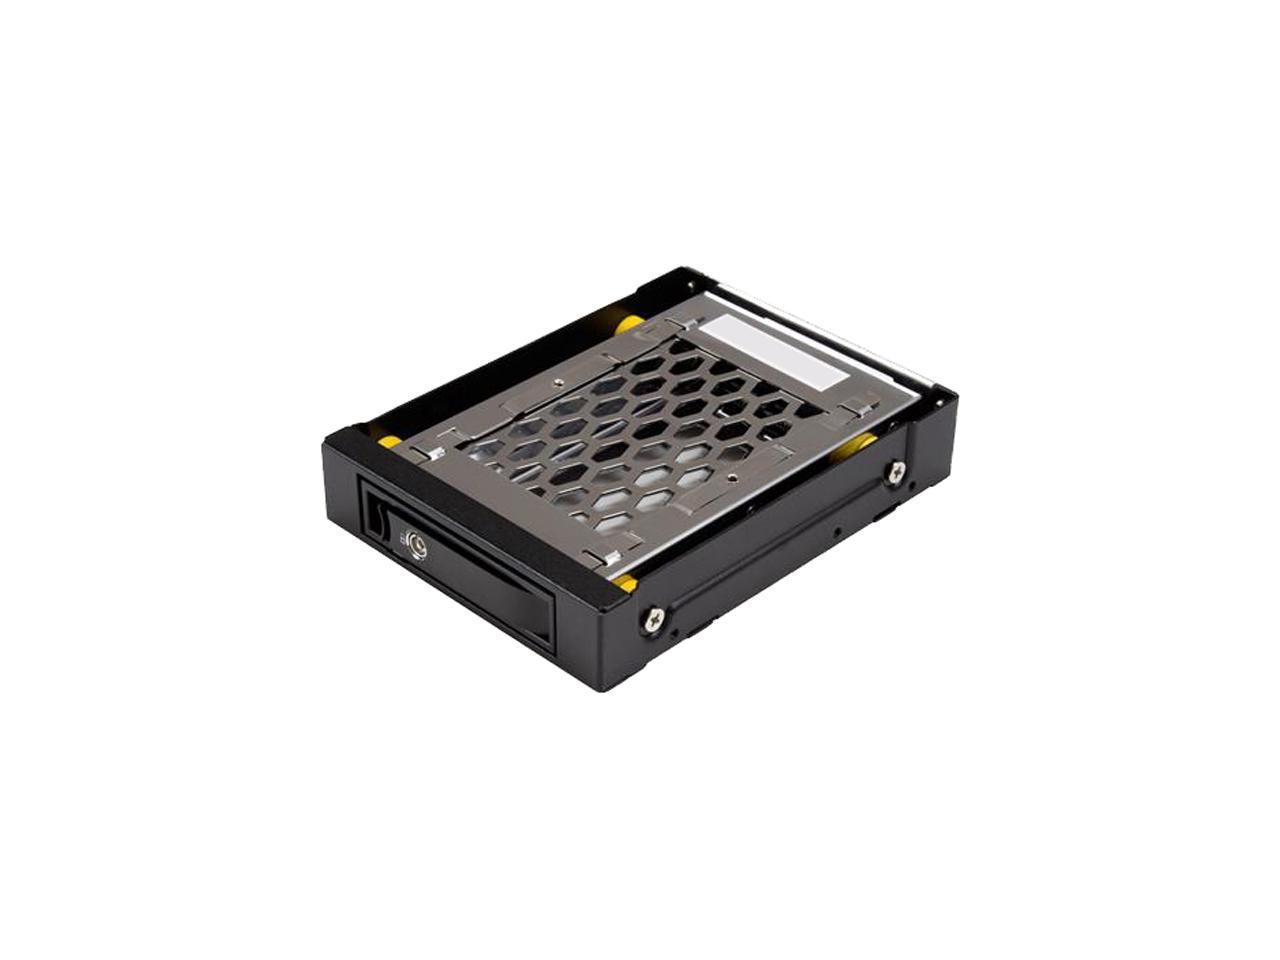 StarTech SATBP125VP 2.5 SATA Drive Hot Swap Bay - for 3.5 ...